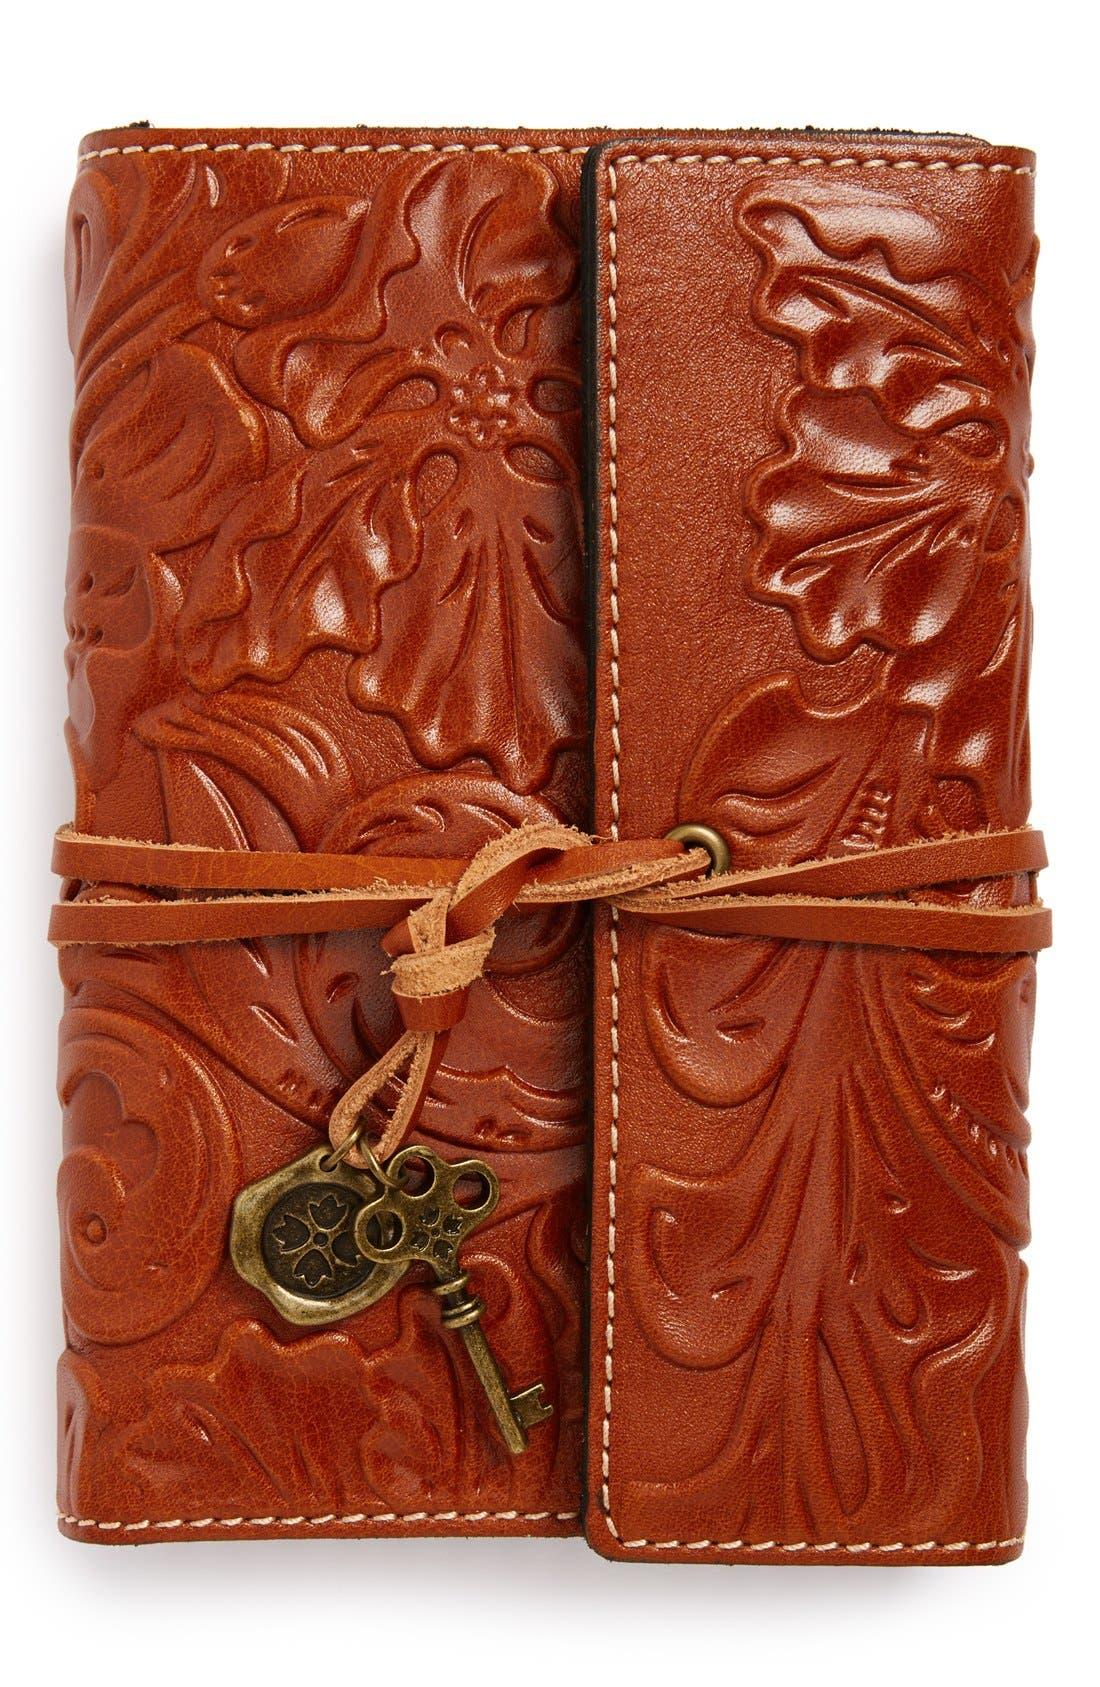 Alternate Image 1 Selected - Patricia Nash 'Carmona' Leather Journal